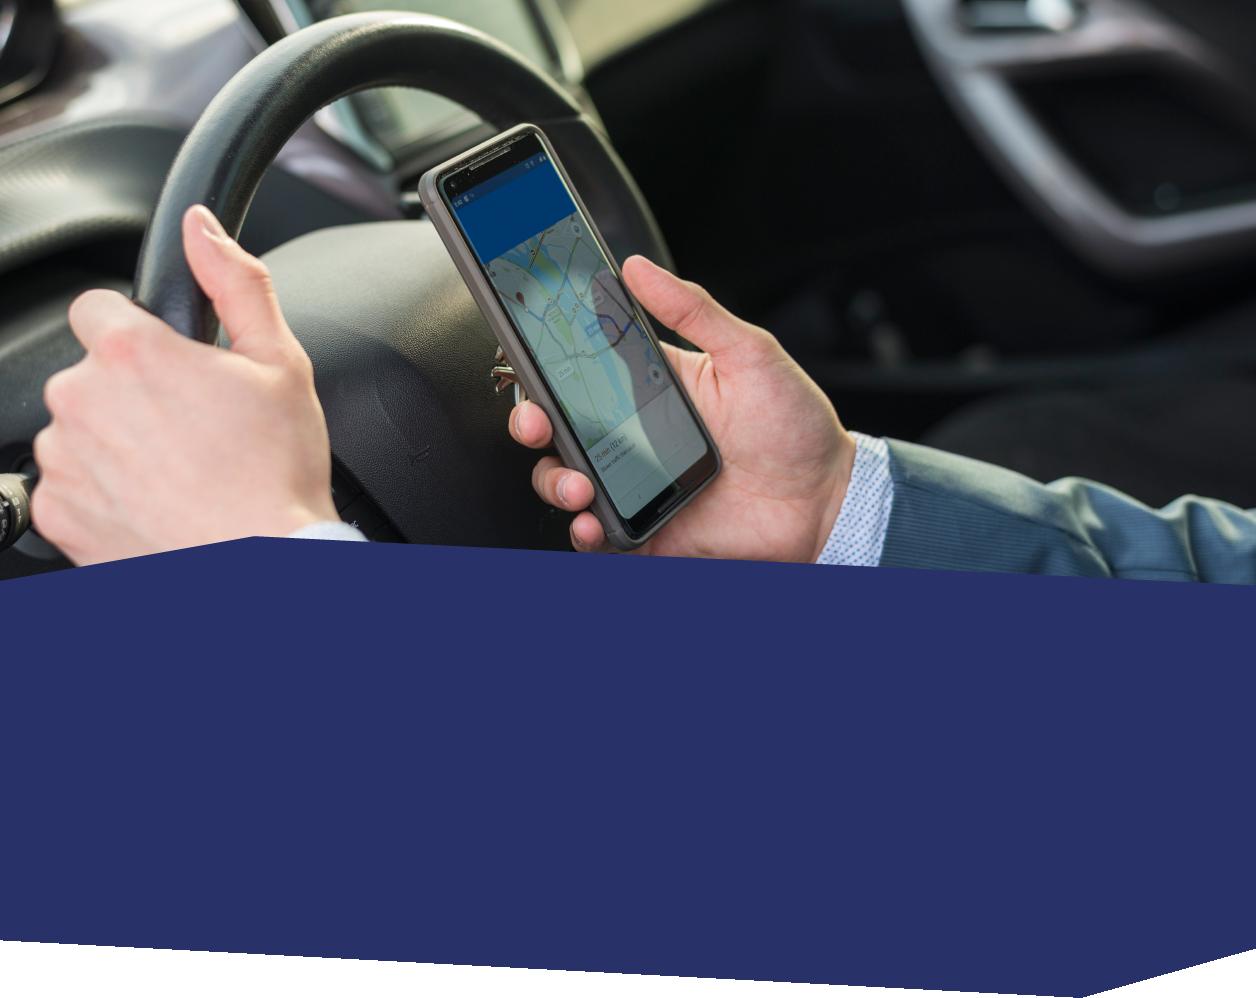 Ch3 smartphone - mileage reimbursement company fit